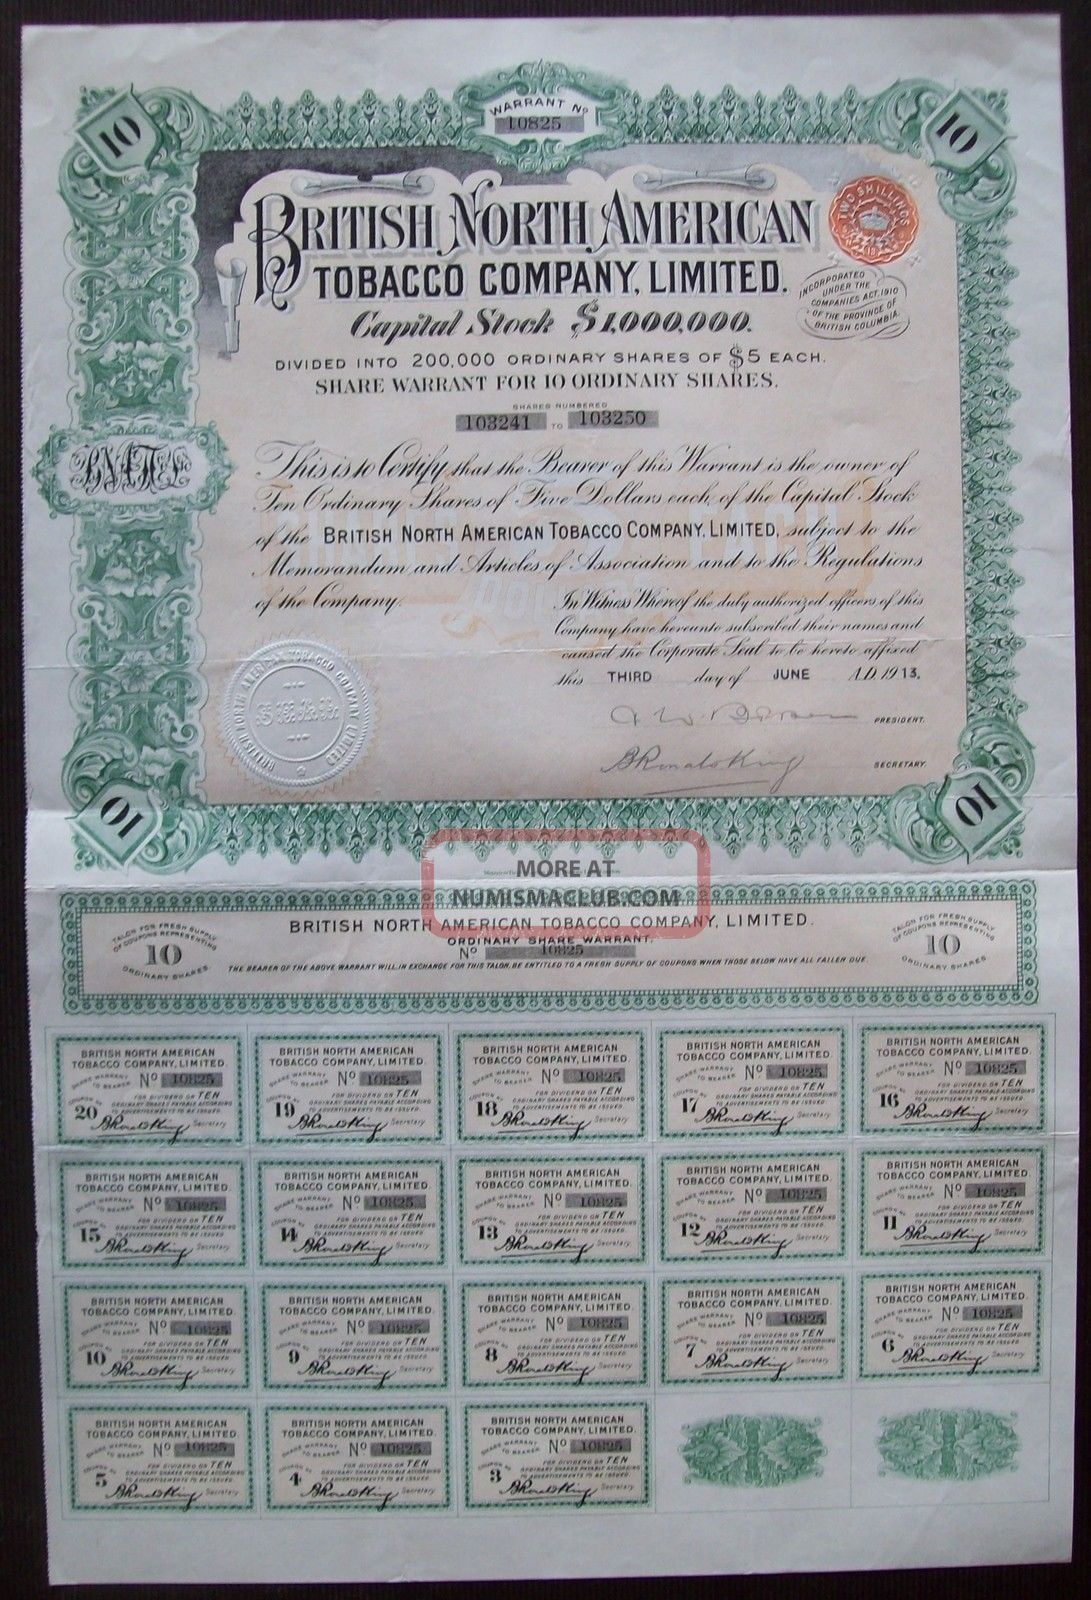 Gb England 1911 Bond The British North American Tobacco Co Ltd - Tabac.  R4058 World photo